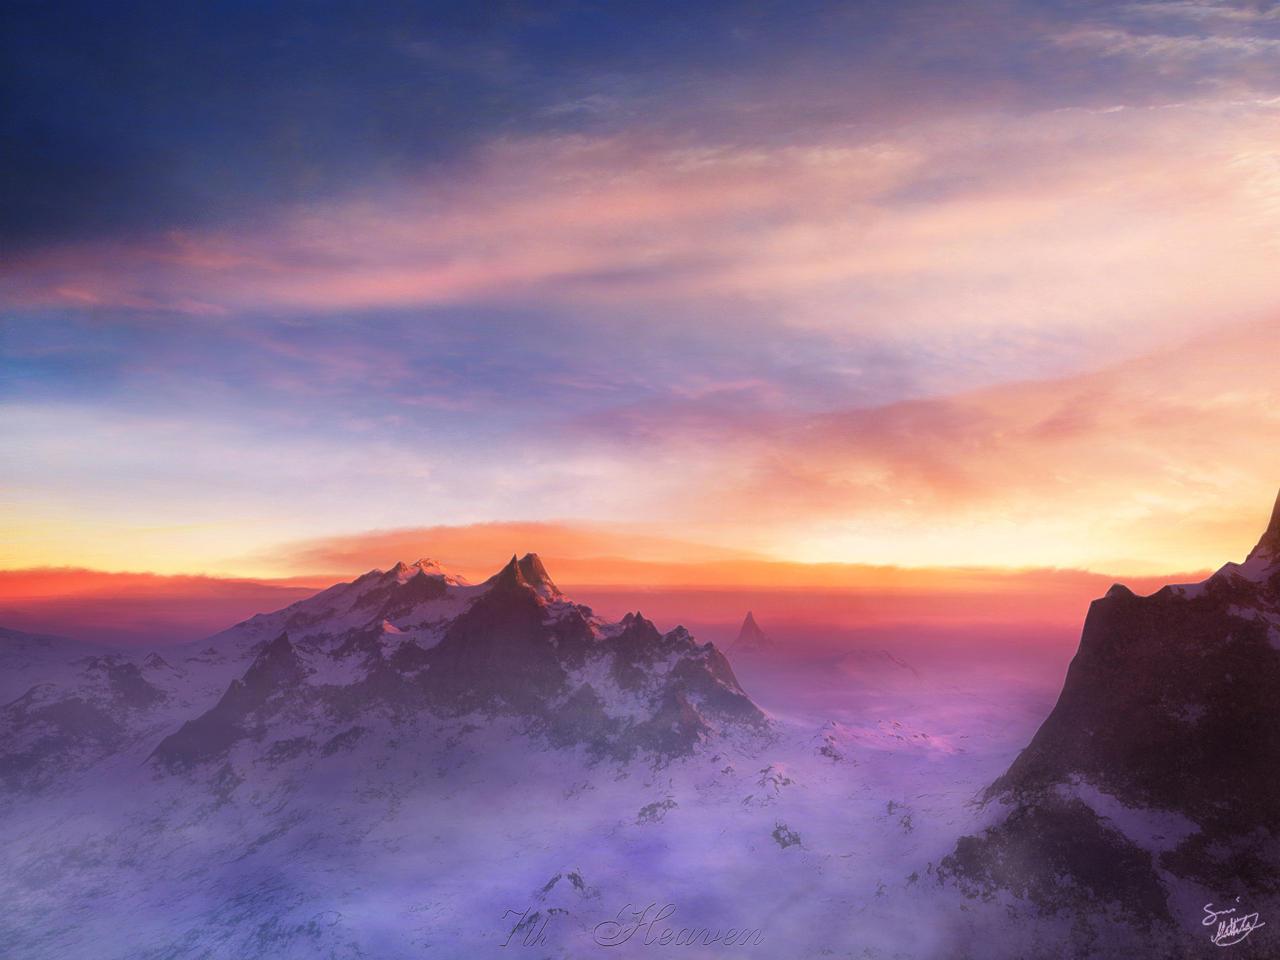 7th Heaven by Smattila